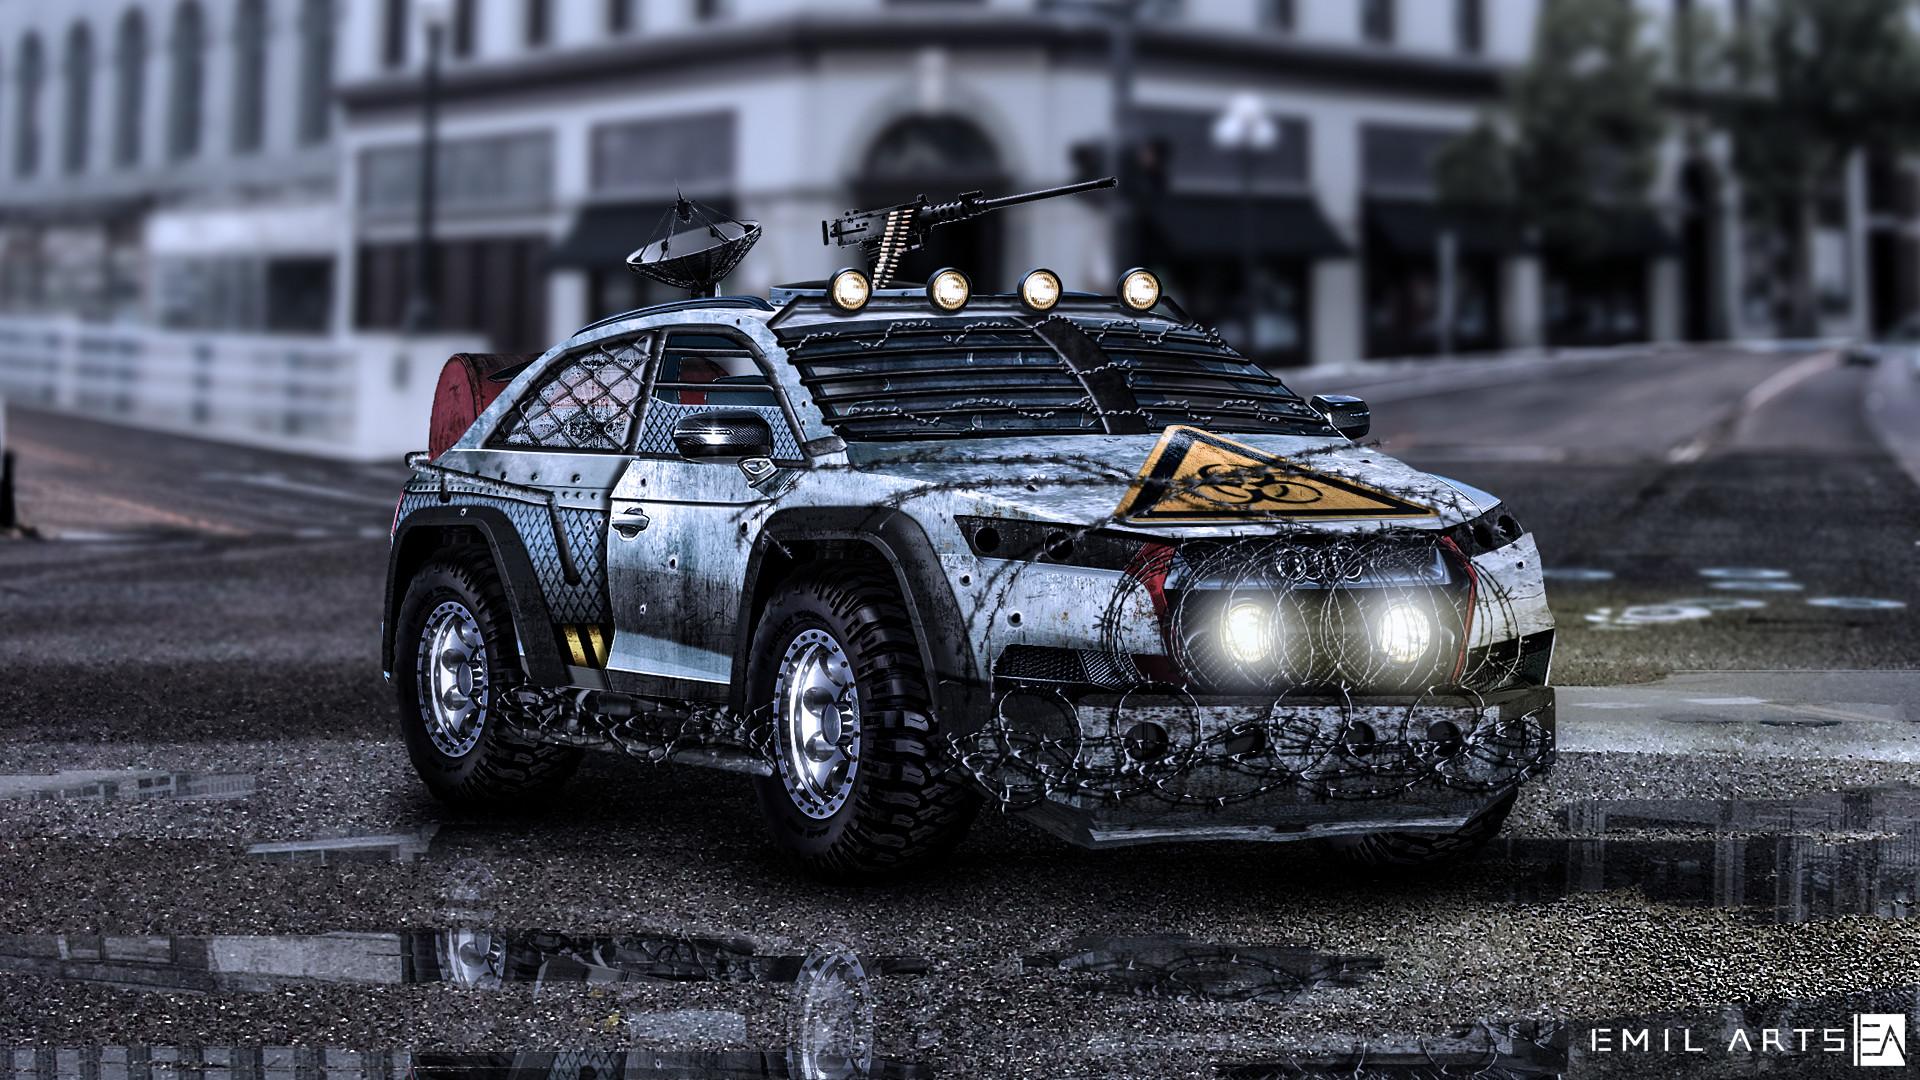 Emil Arts Audi Q7 2015 Zombie Killer